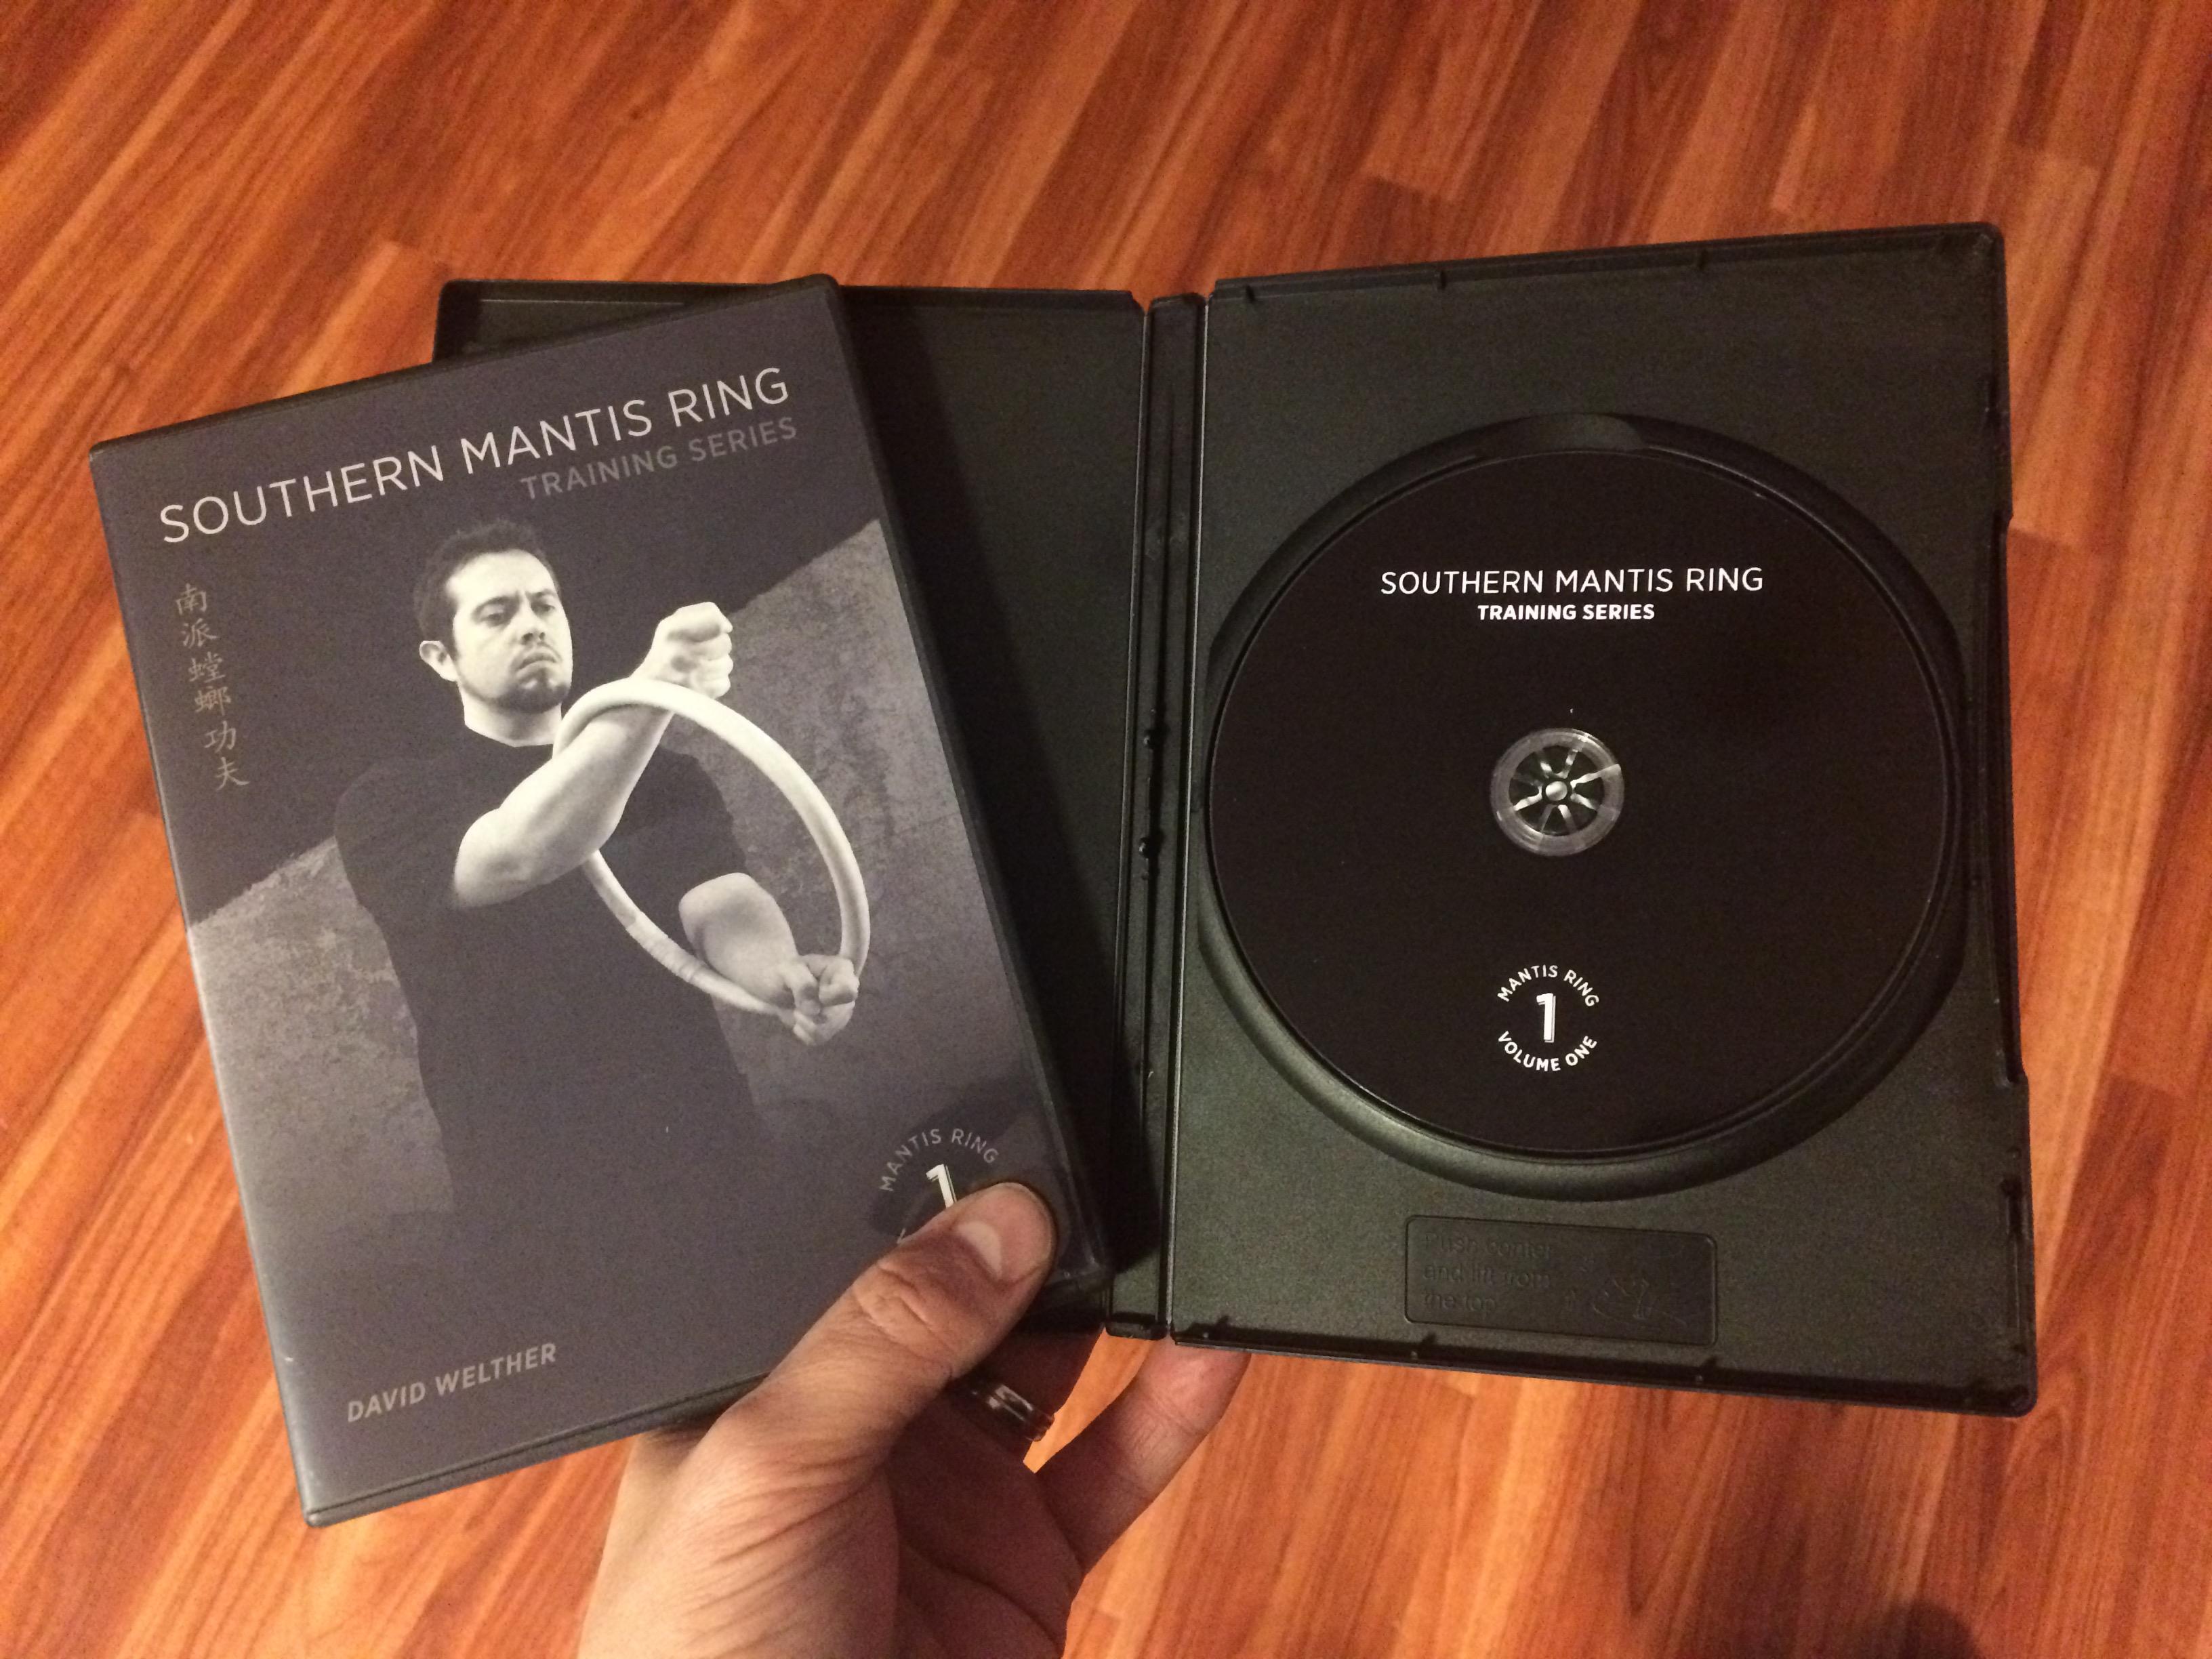 DVD PIC